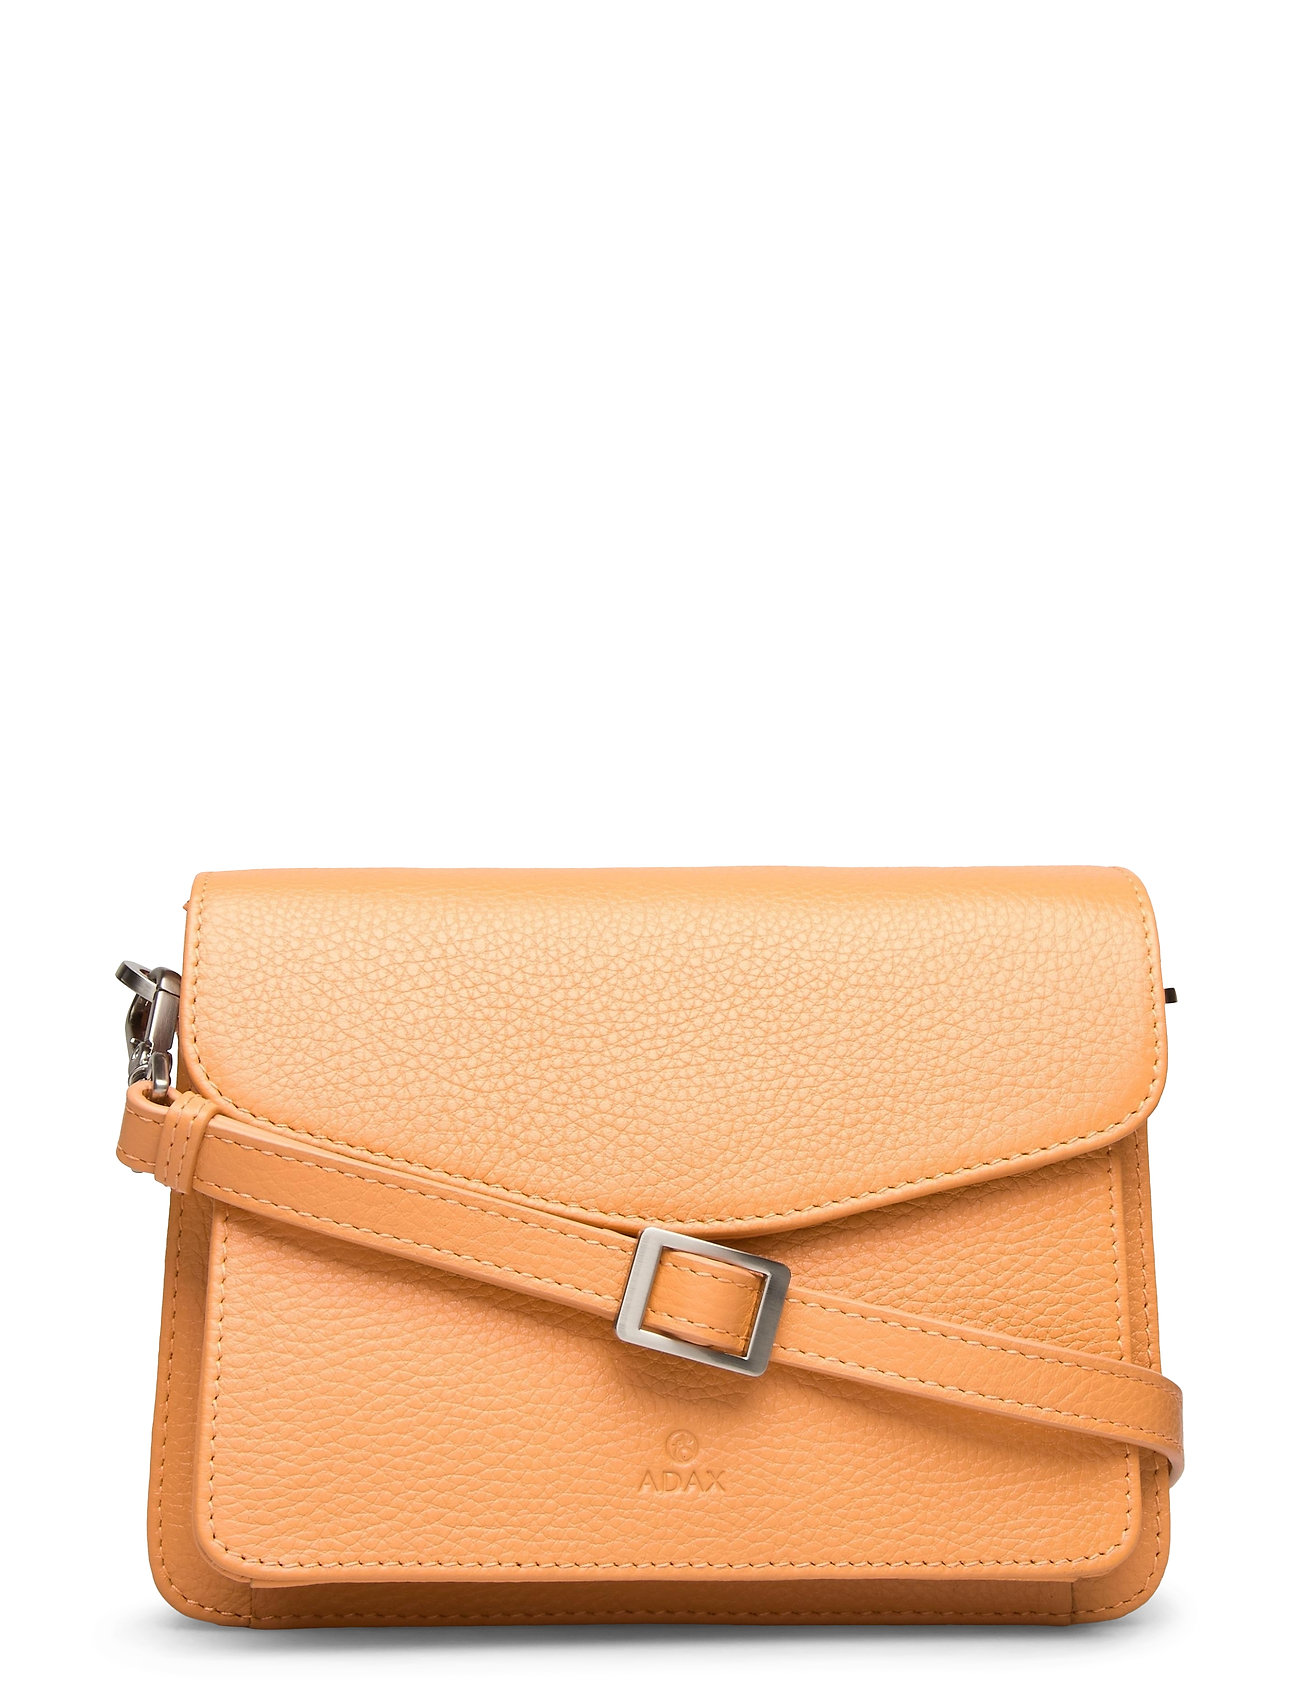 Adax Cormorano shoulder bag Thea - PEACH